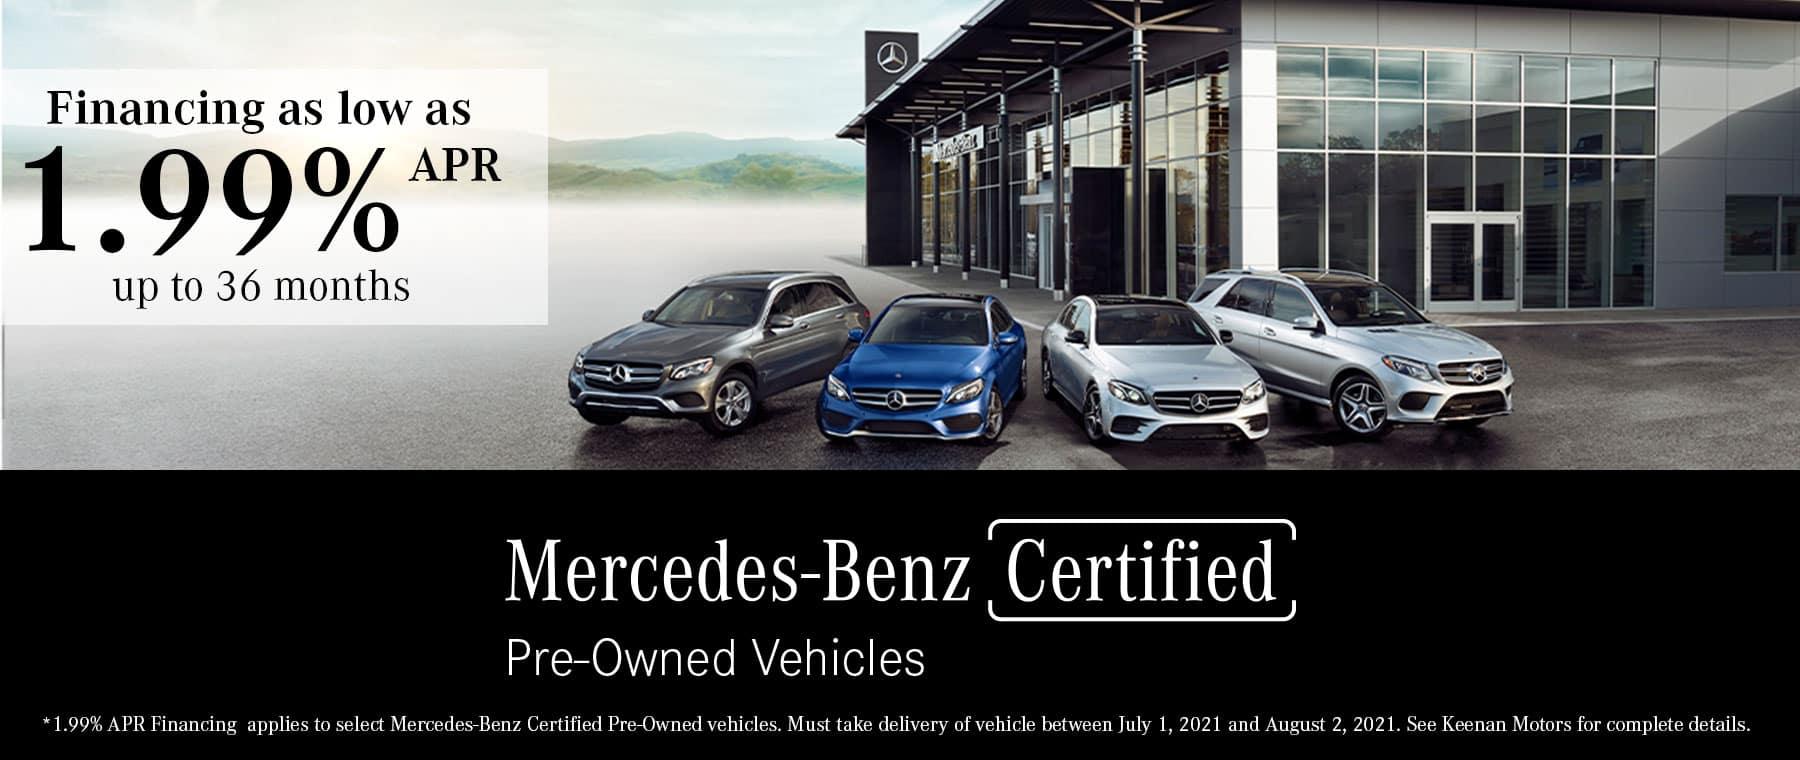 Mercedes-Benz Certified Pre-Owned Financing at Keenan Motors